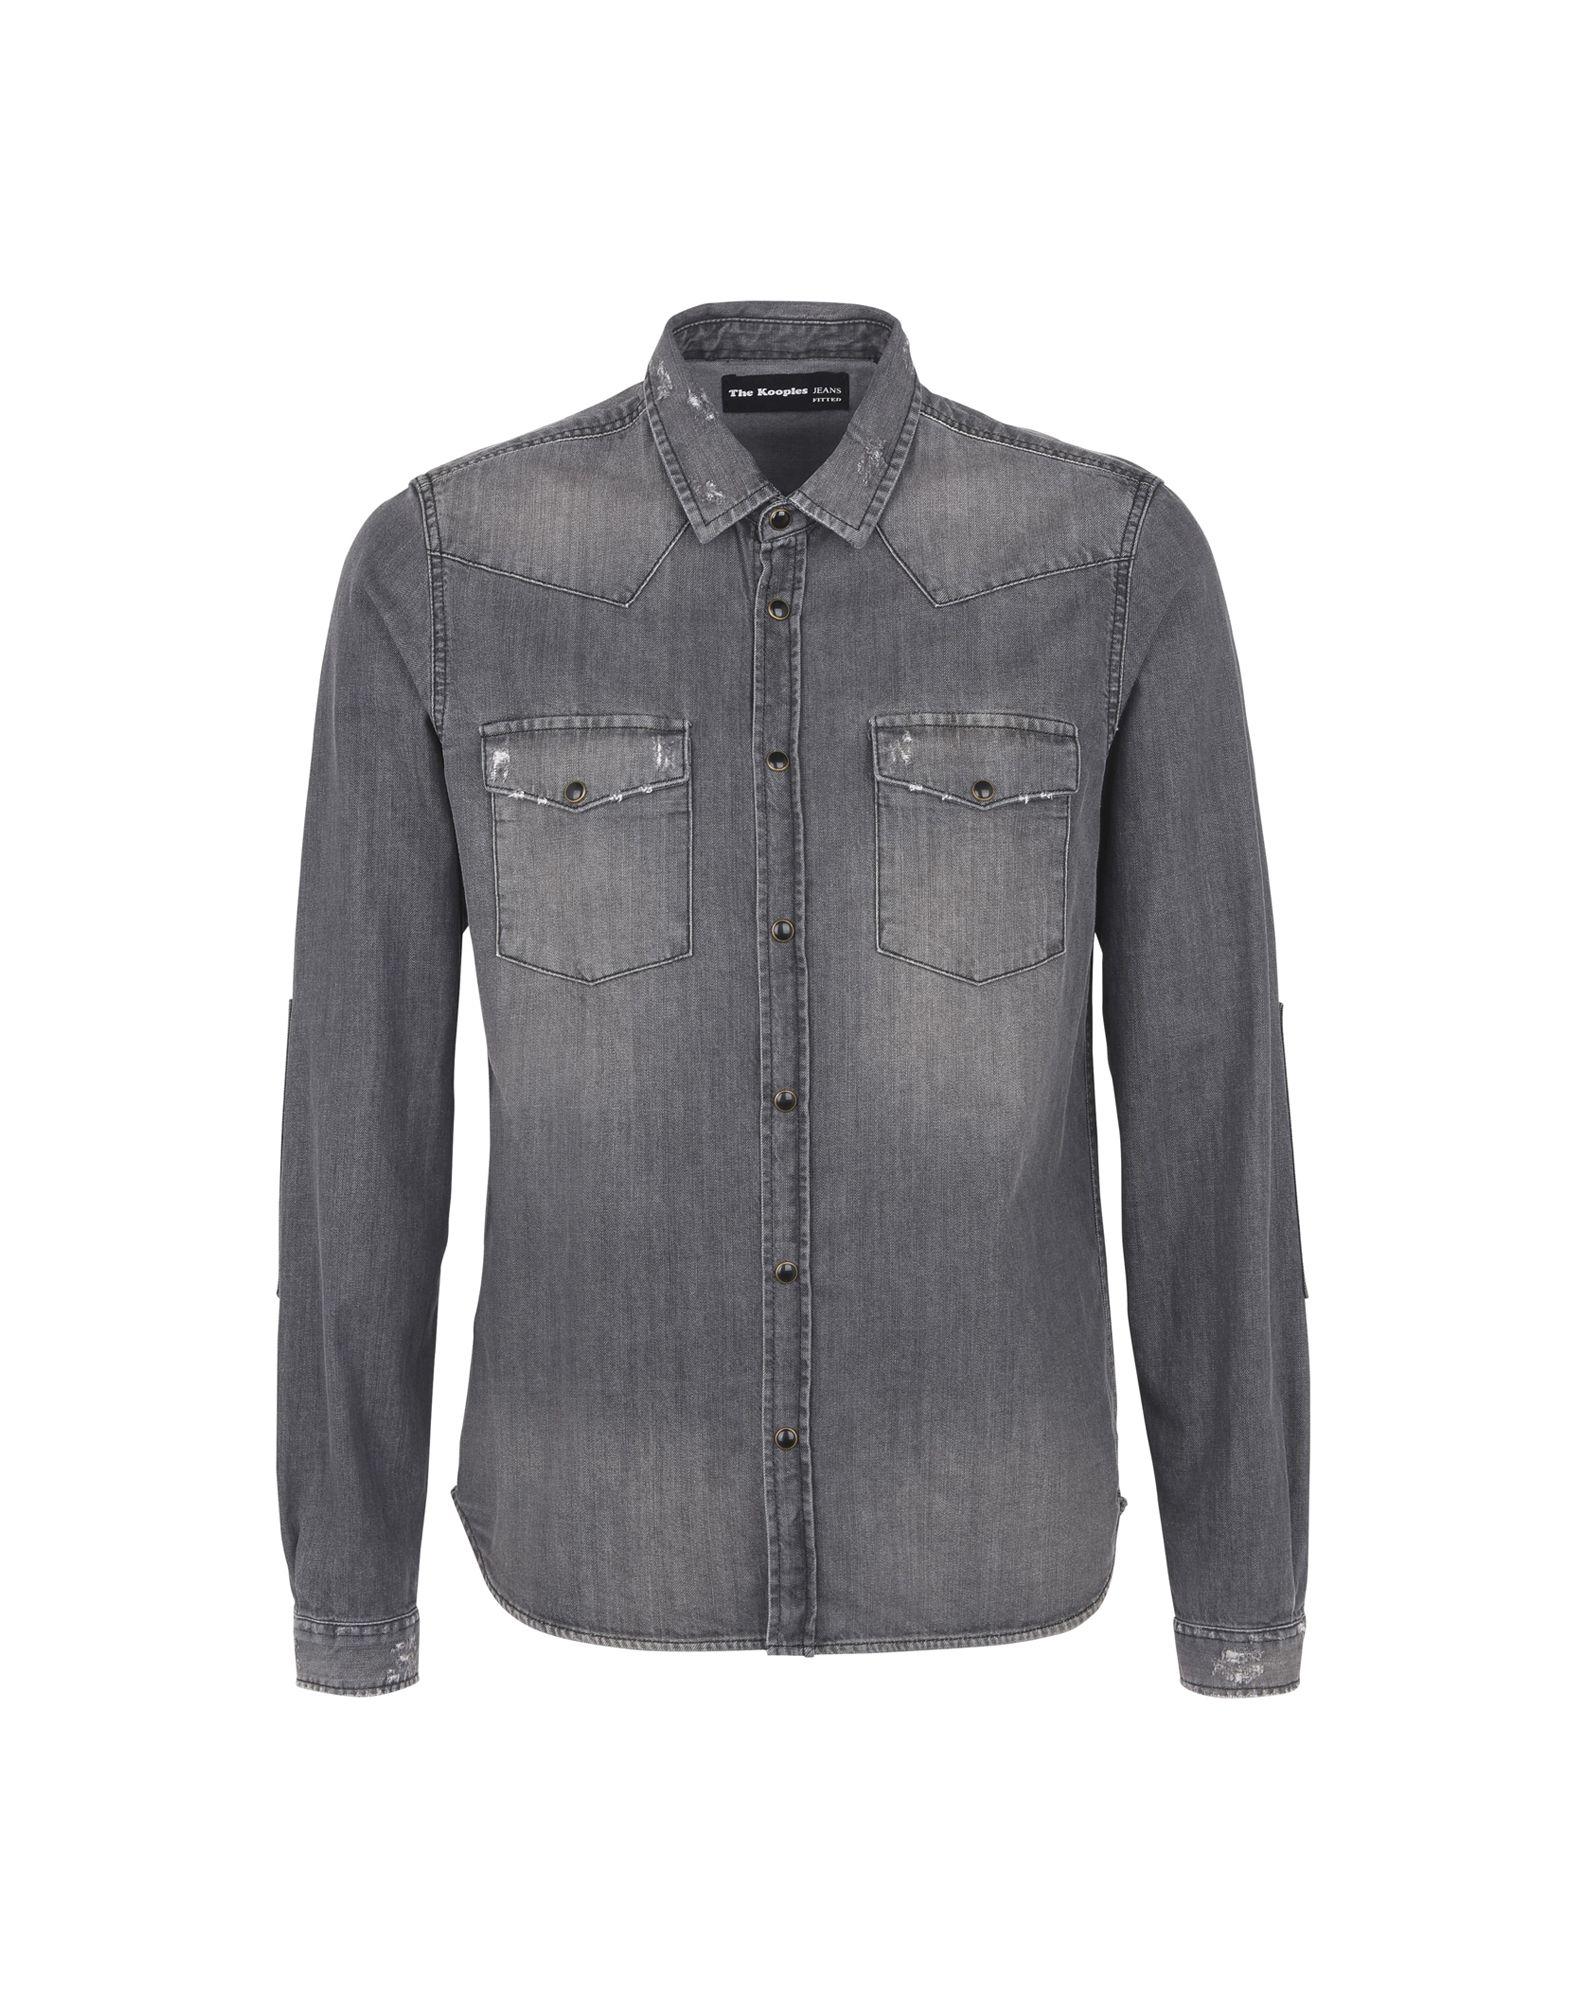 d2a531e821b The Kooples Denim Shirt - Men The Kooples Denim Shirts online on ...